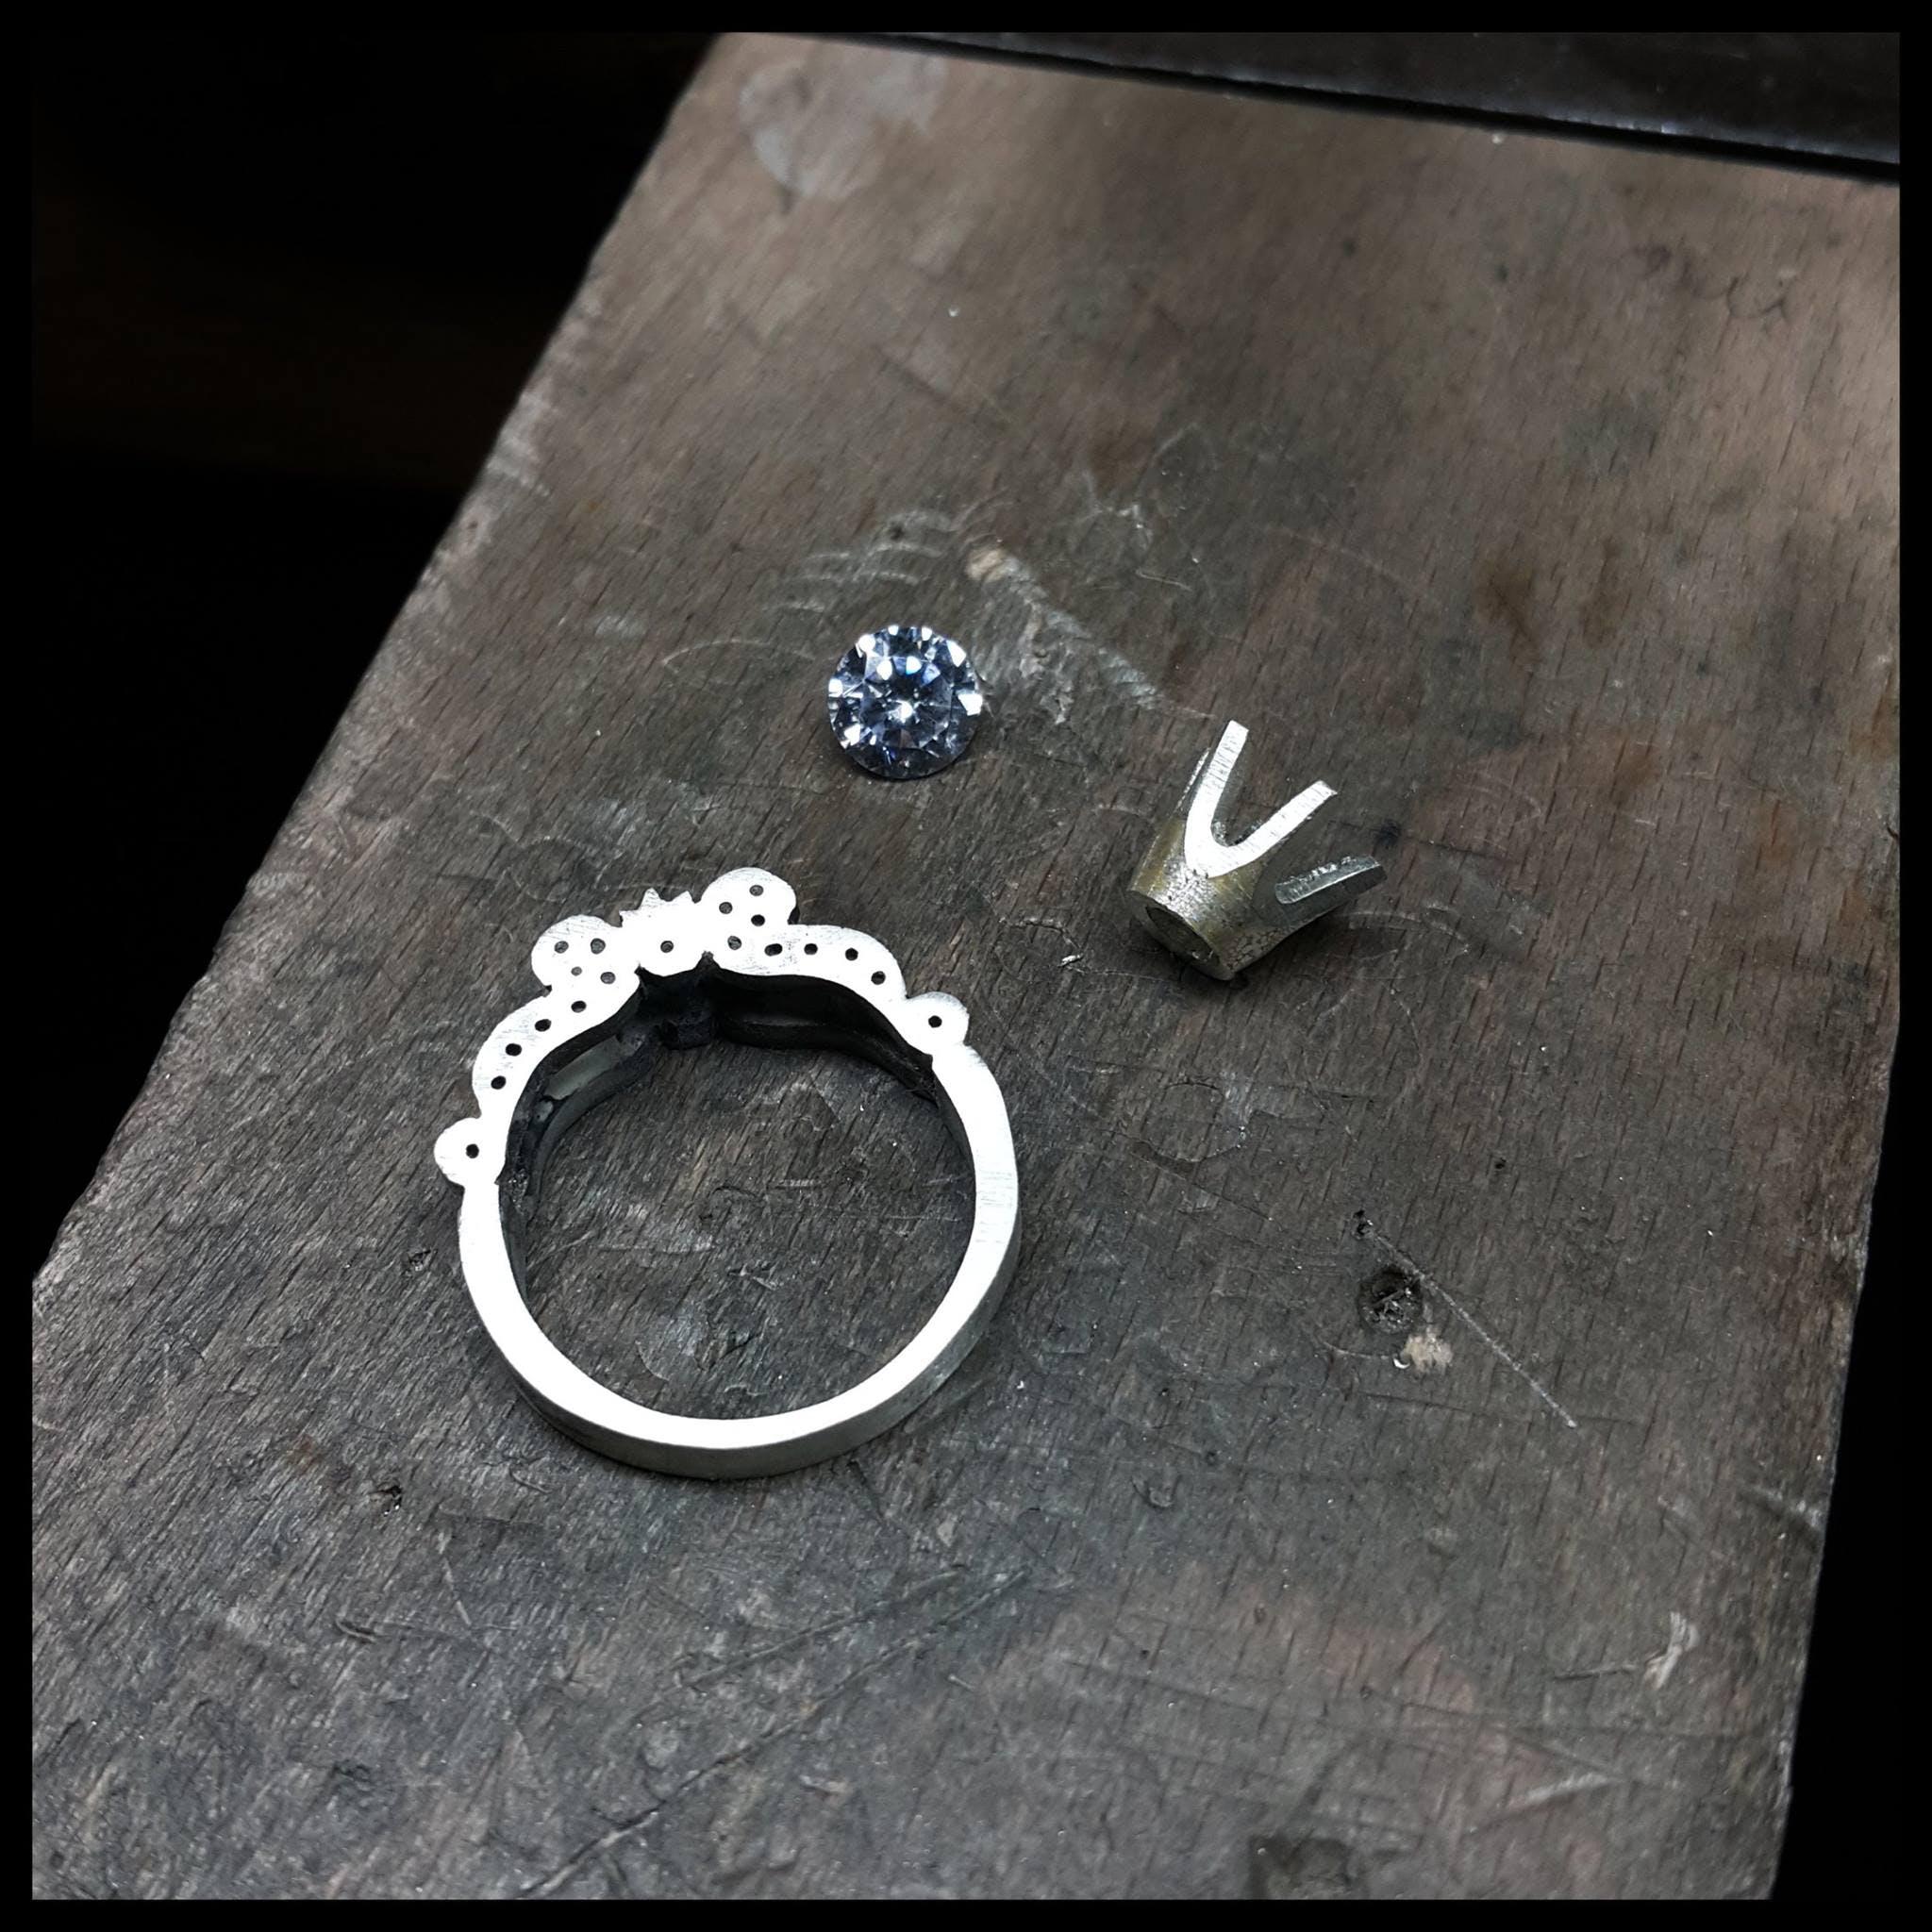 Pierścionek w trakcie montażu.